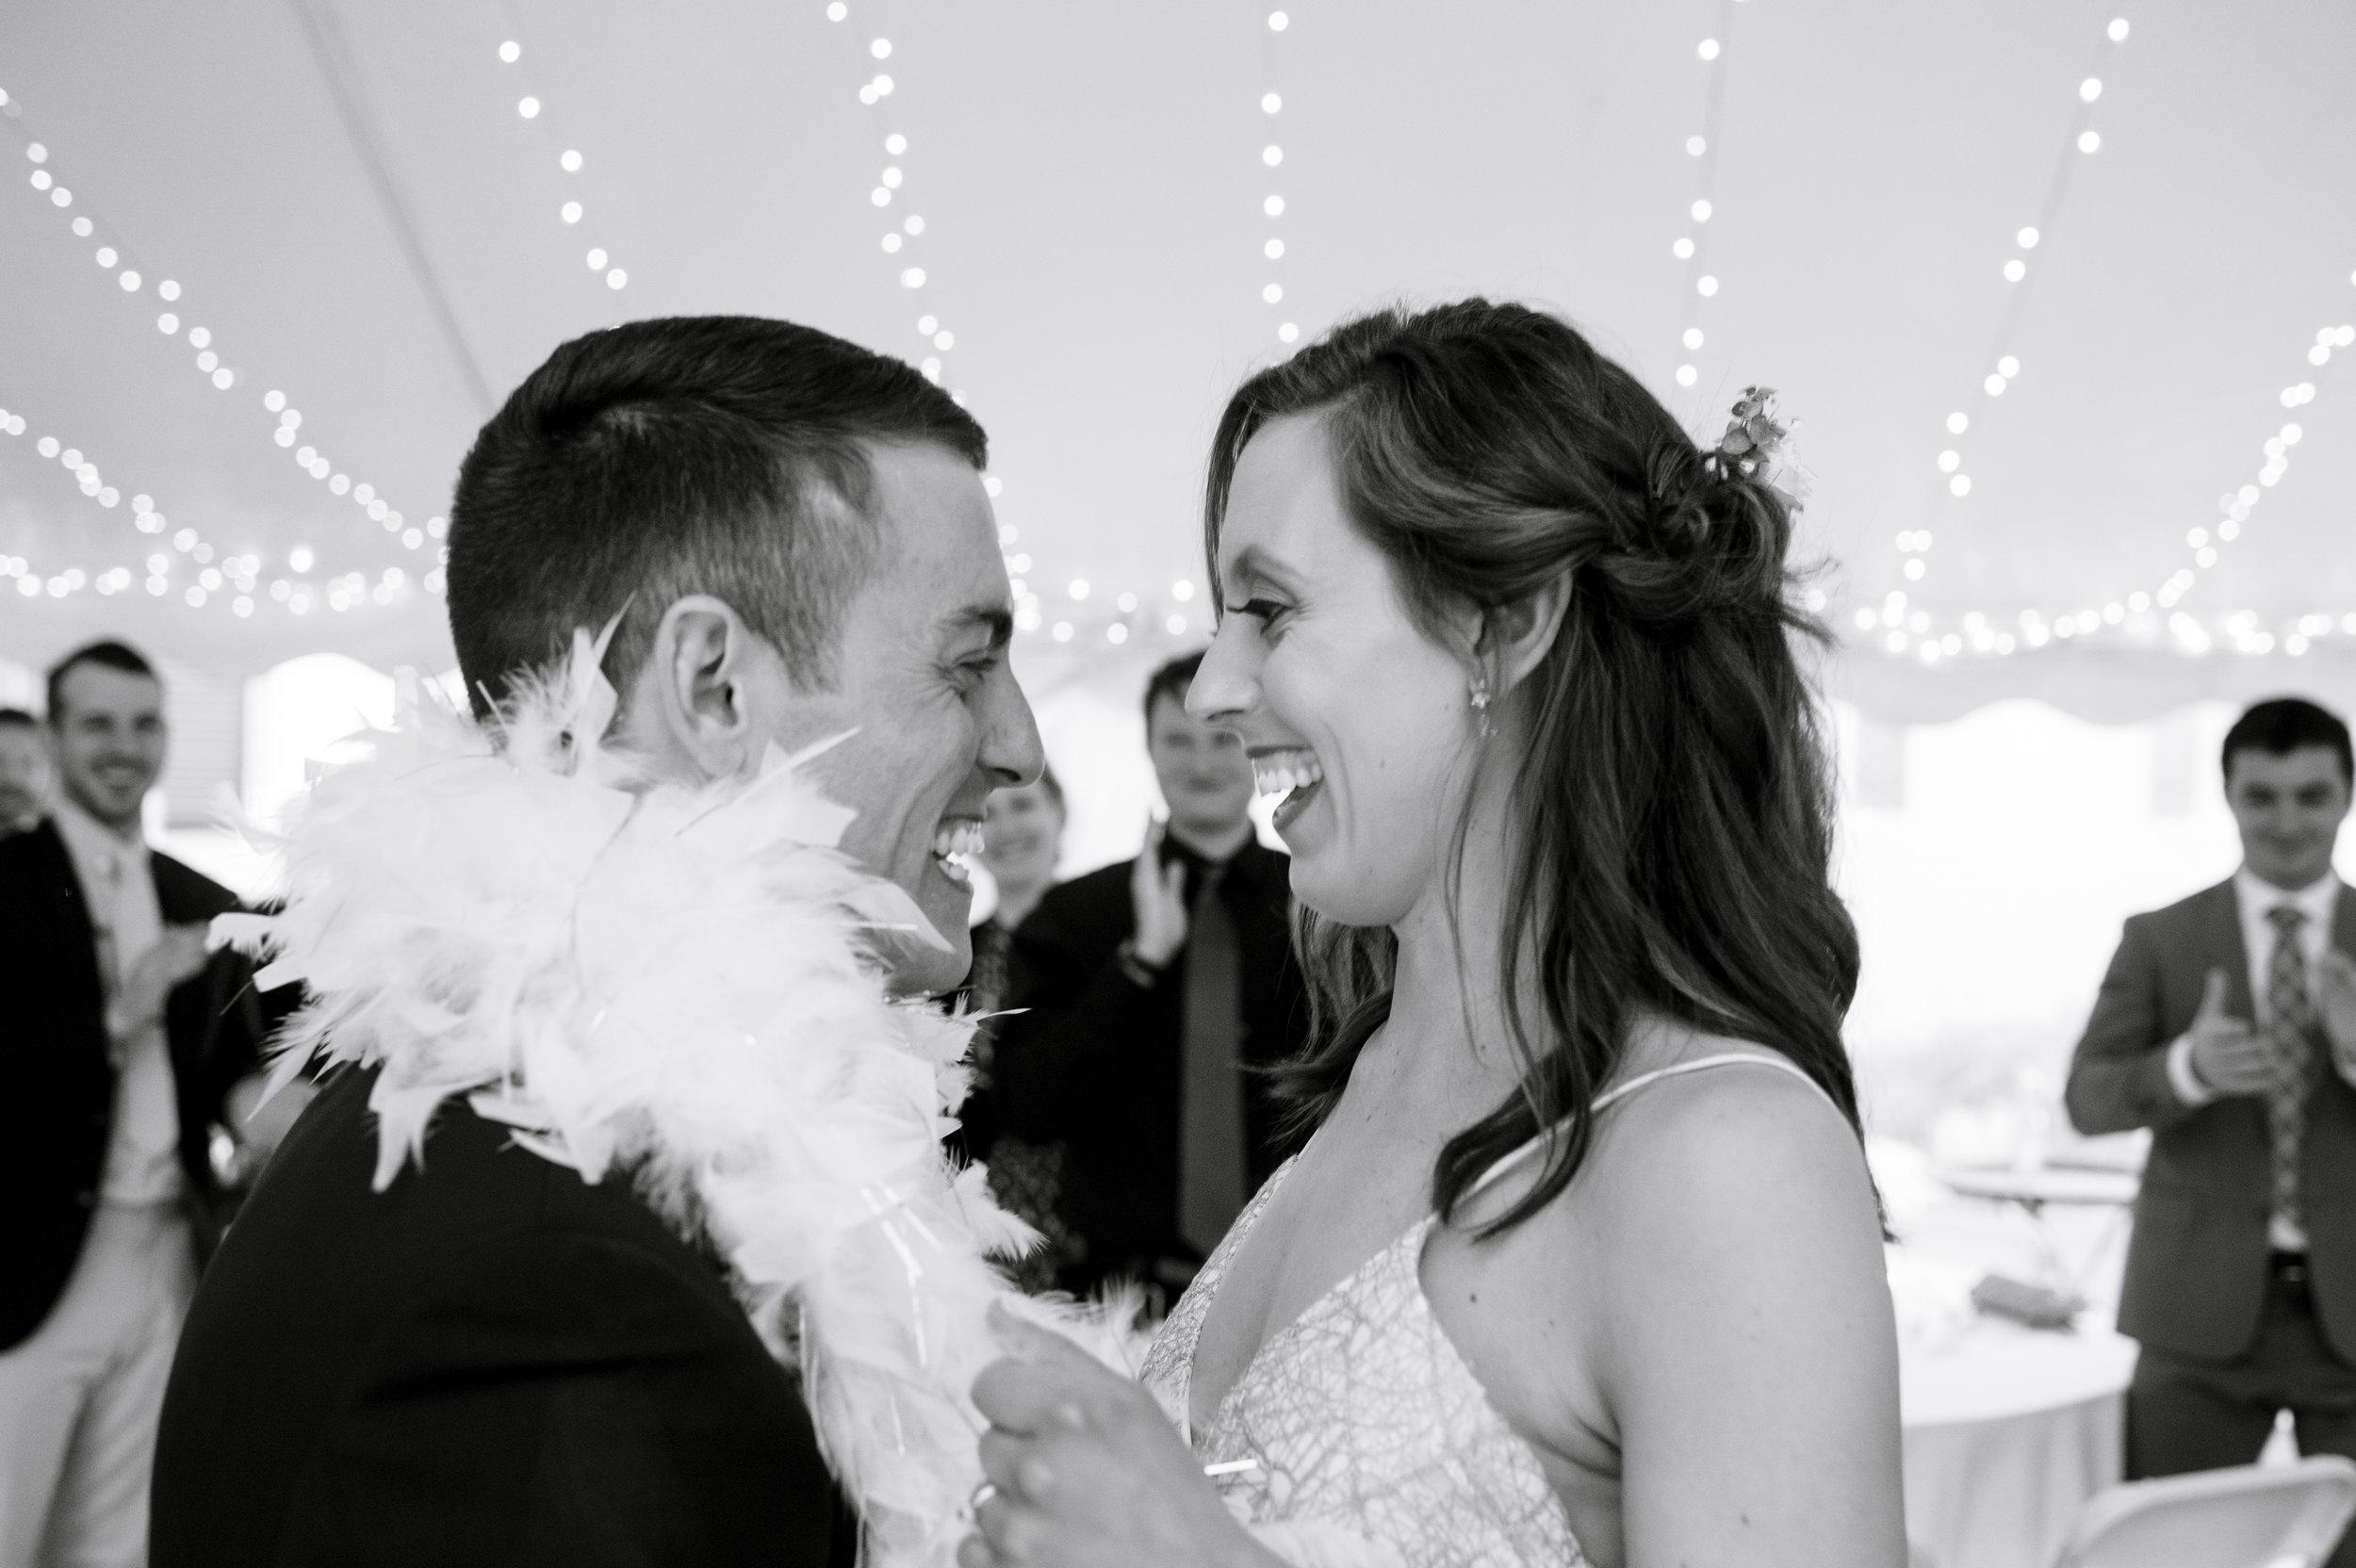 Candid-Wedding-Photography-Boston023.jpg